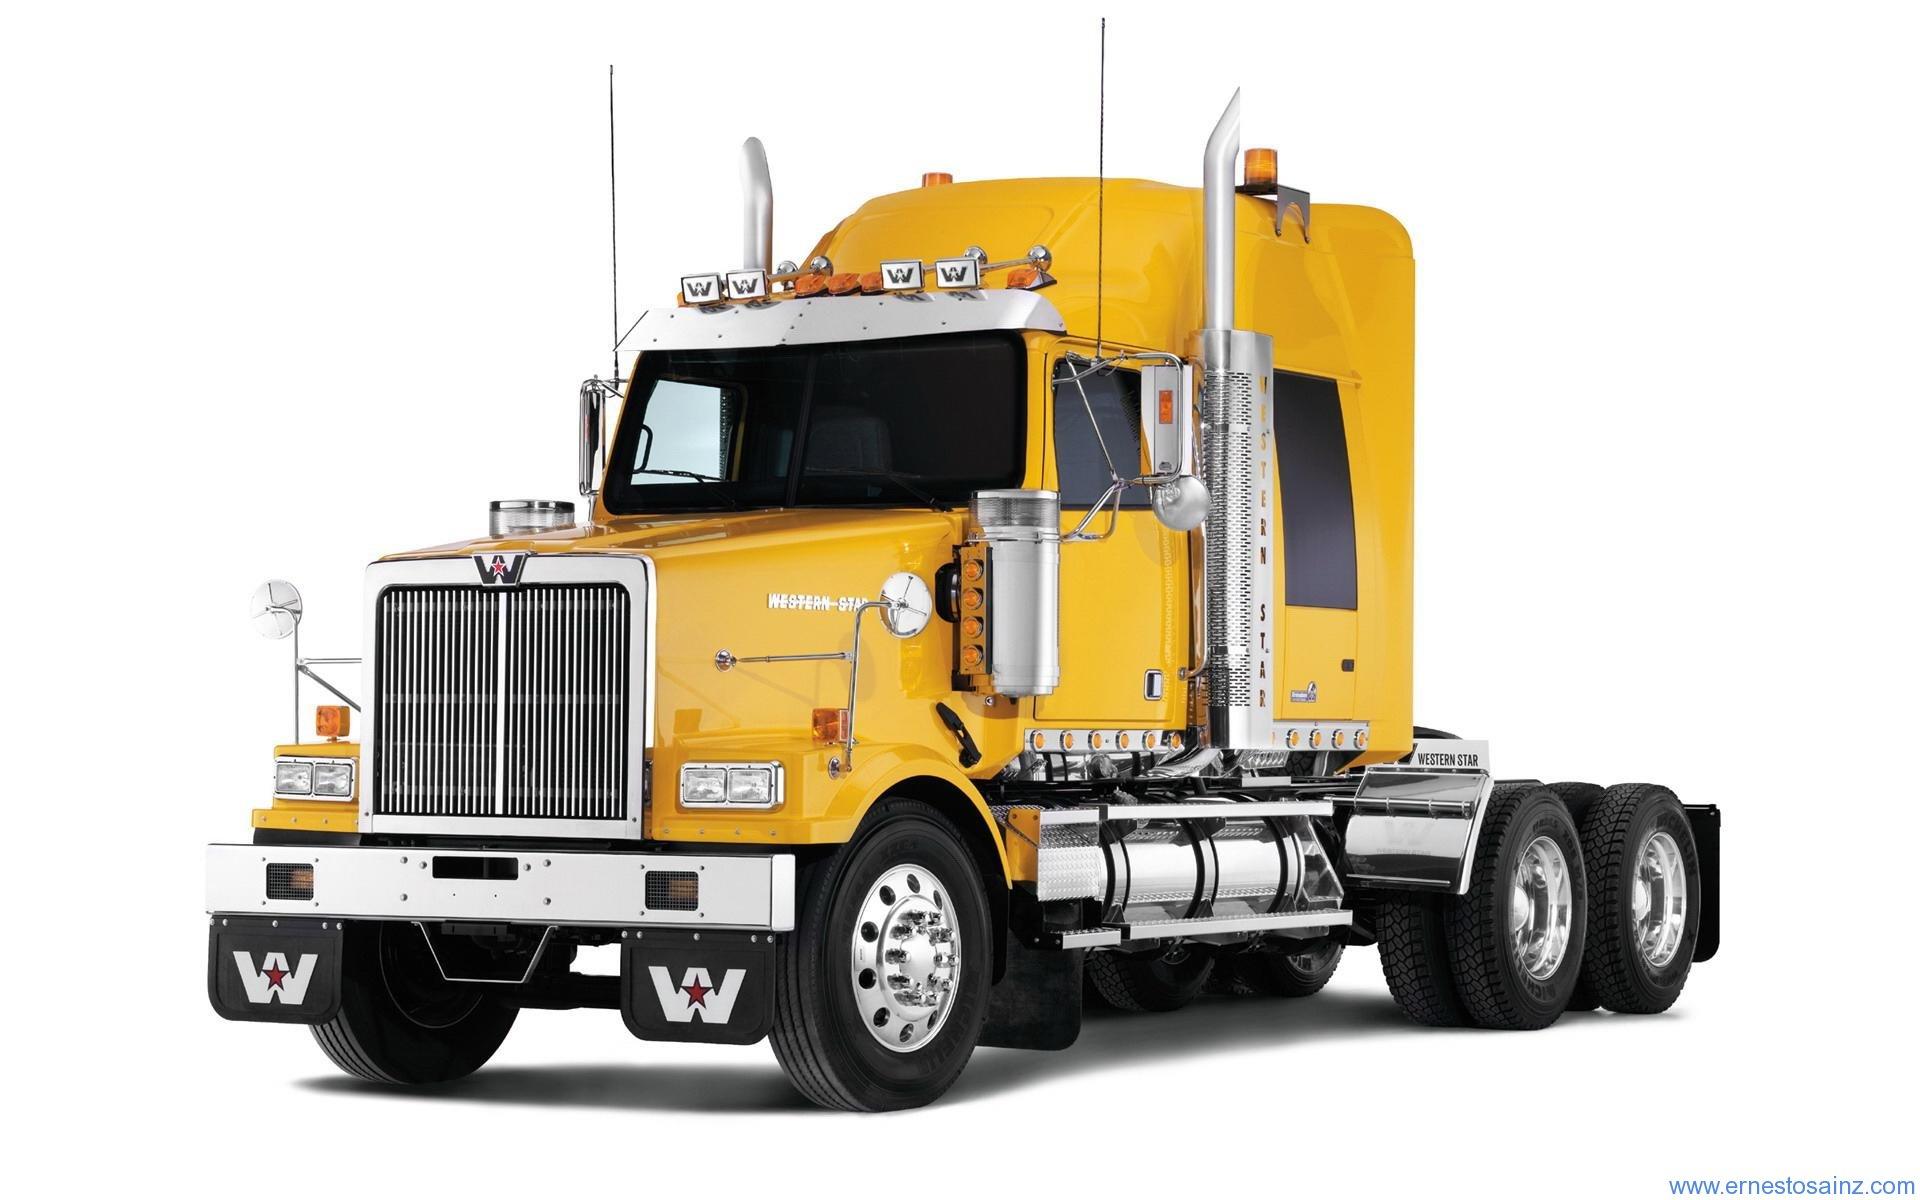 camion-western-amarillo